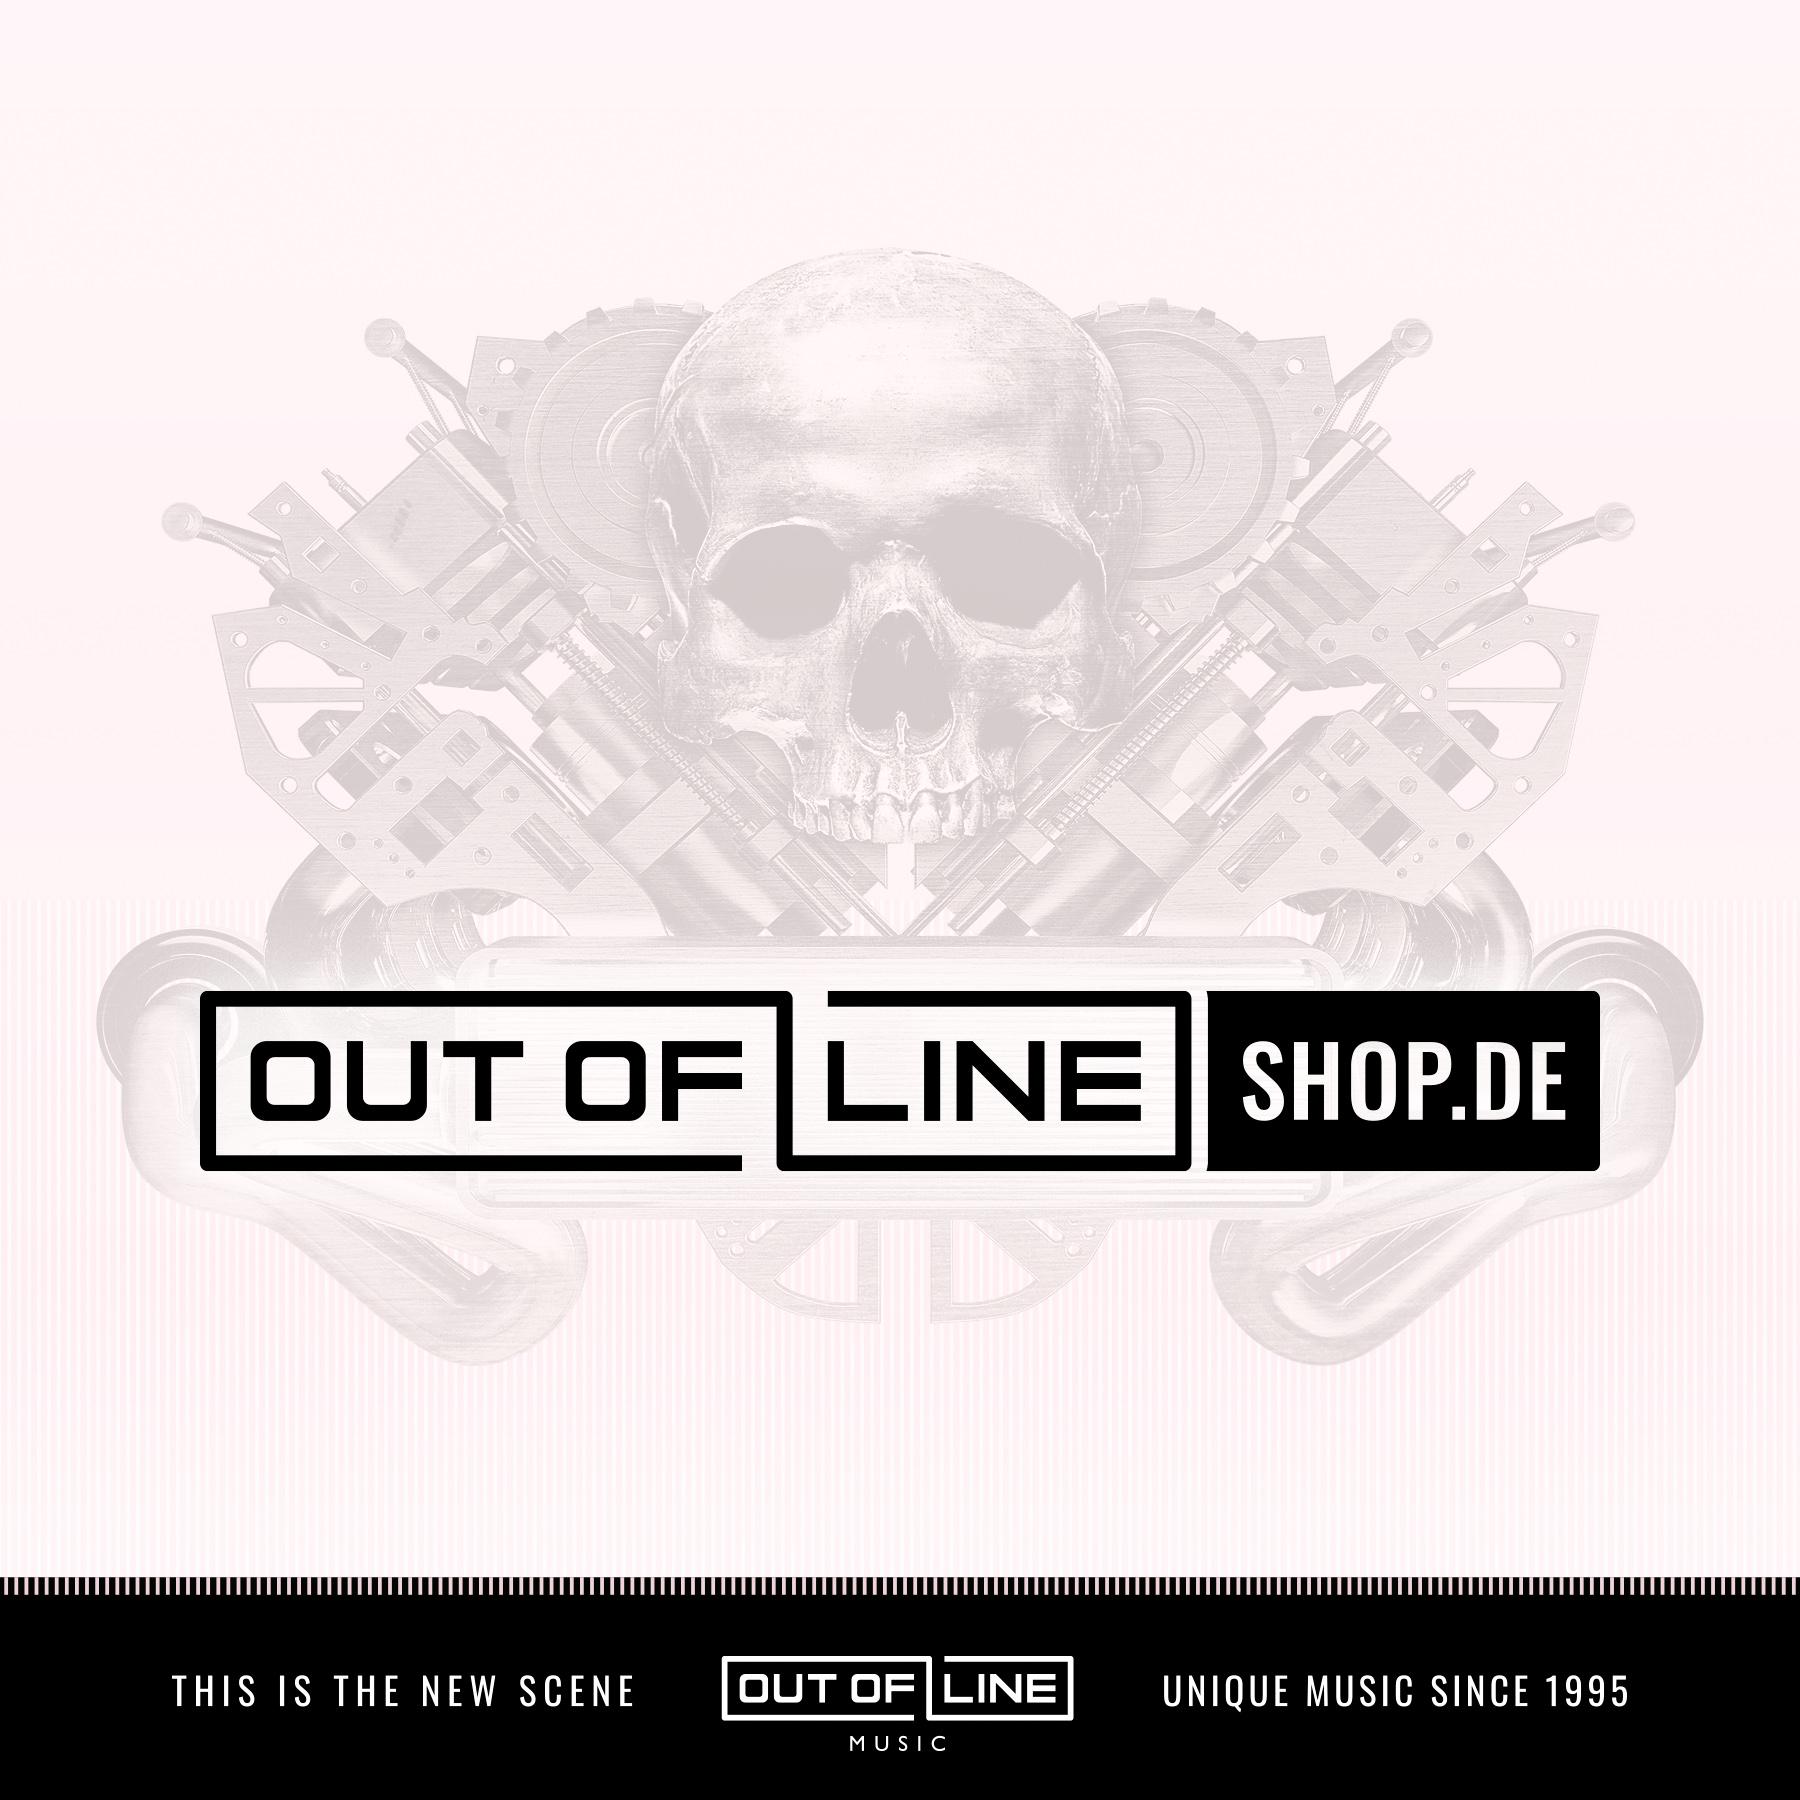 Eisfabrik - Rotationsausfall in der Eisfabrik - CD EP